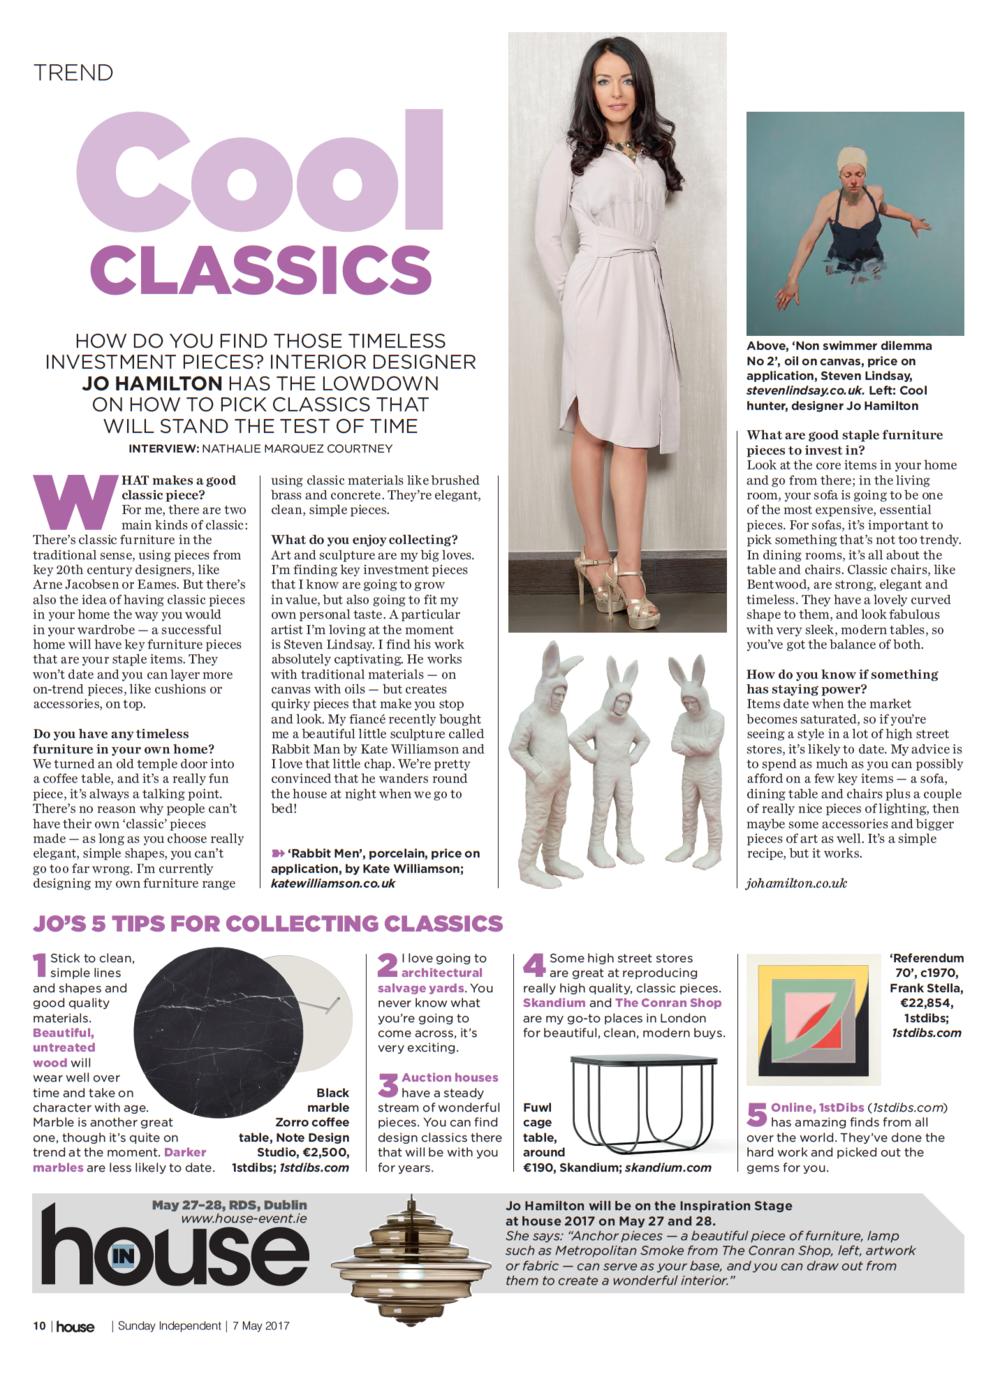 Luxury interior designer Jo Hamilton in Irish Sunday Independent May 2017.jpg